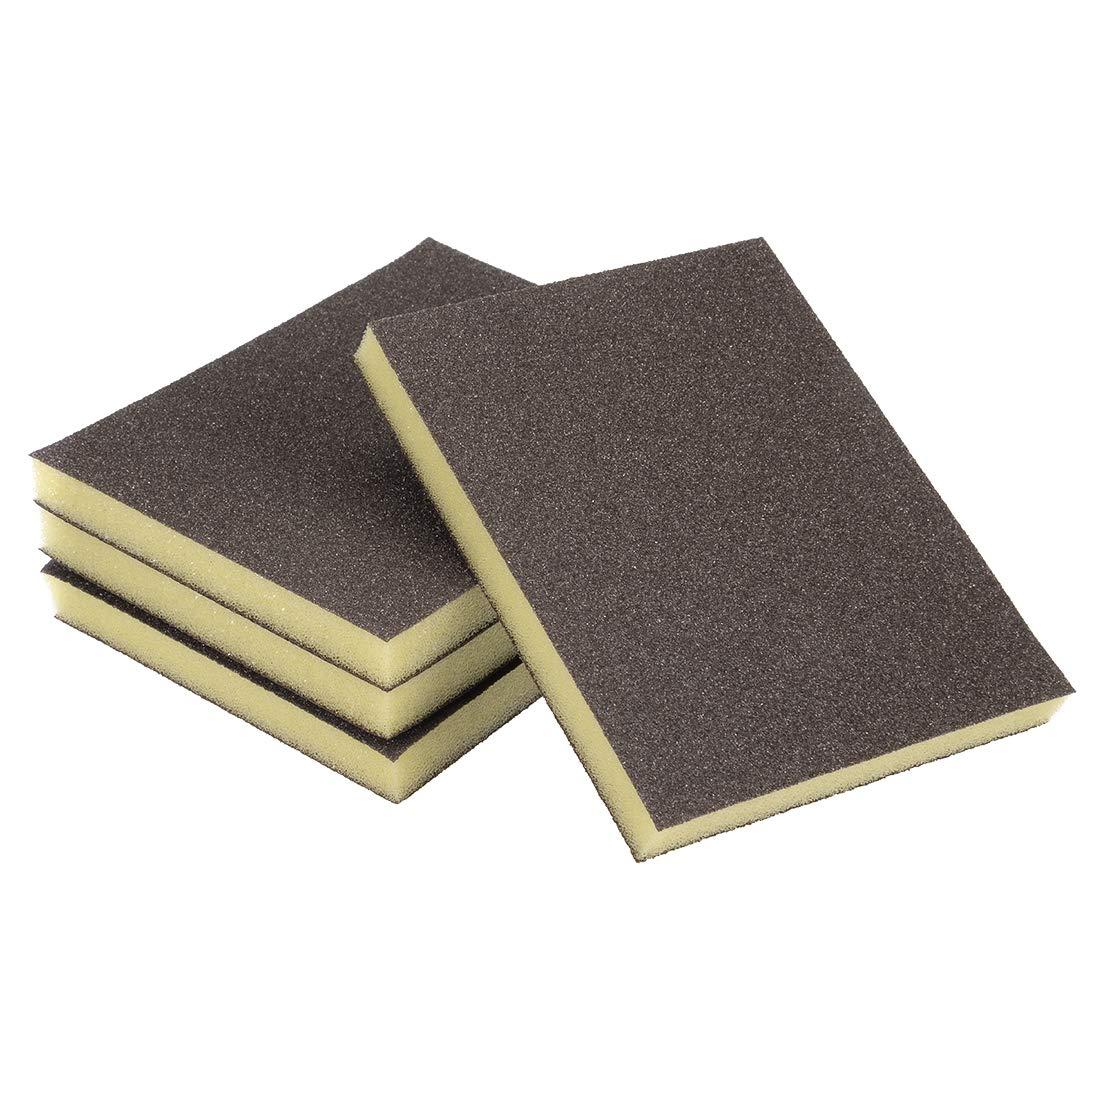 Esponja de lija Sourcingmap grano grueso 100 Grit bloque de lija Pad 4.72 x 3.86 x 0.47 Tama/ño 8 piezas